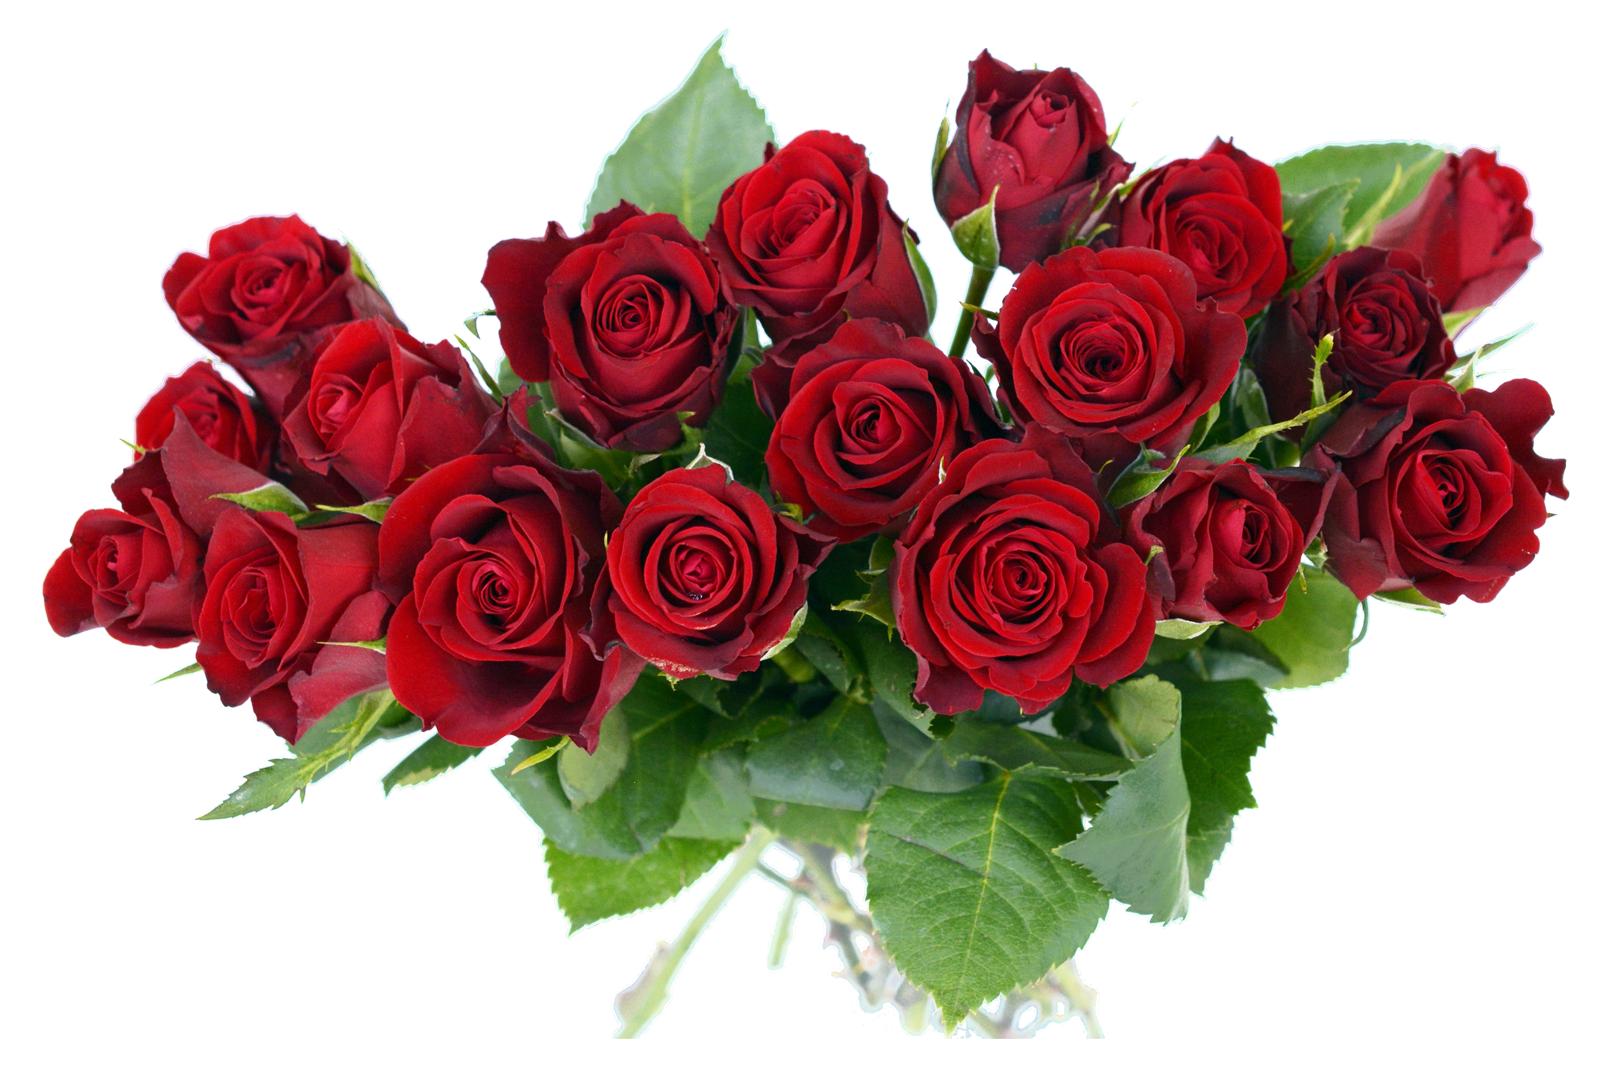 Rose Bouquet PNG Image.